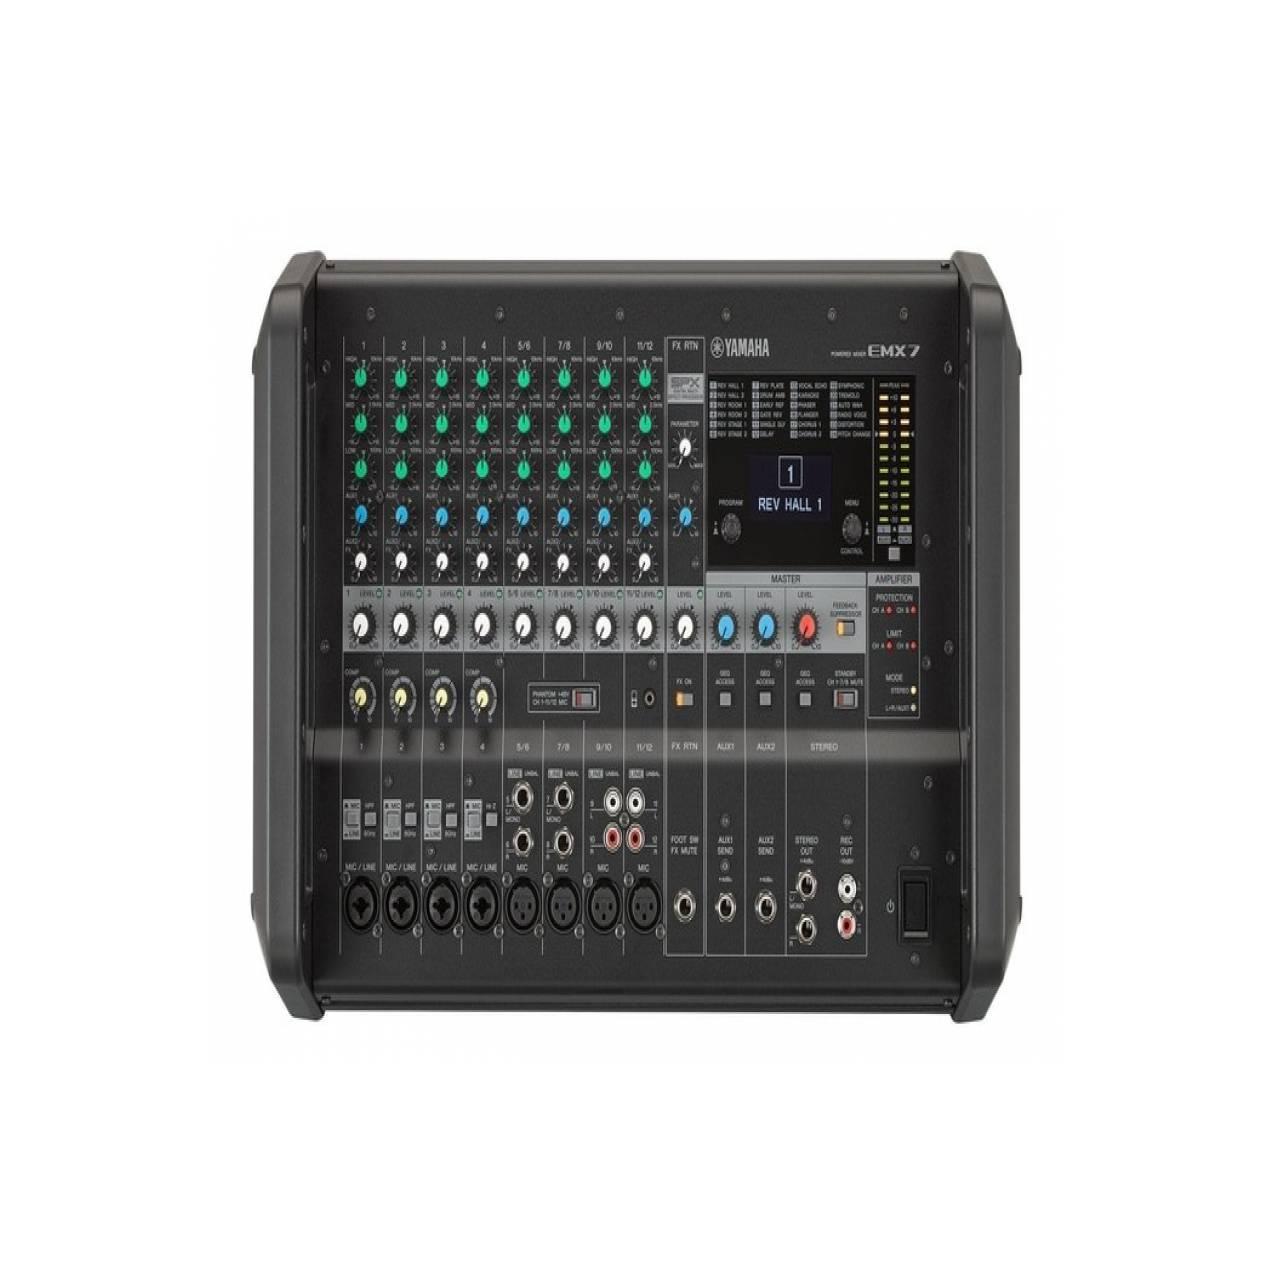 Dusen Berg Power Mixer 12 Channel Pmx 1202d Daftar Harga Terkini Original Yamaha Emx 7